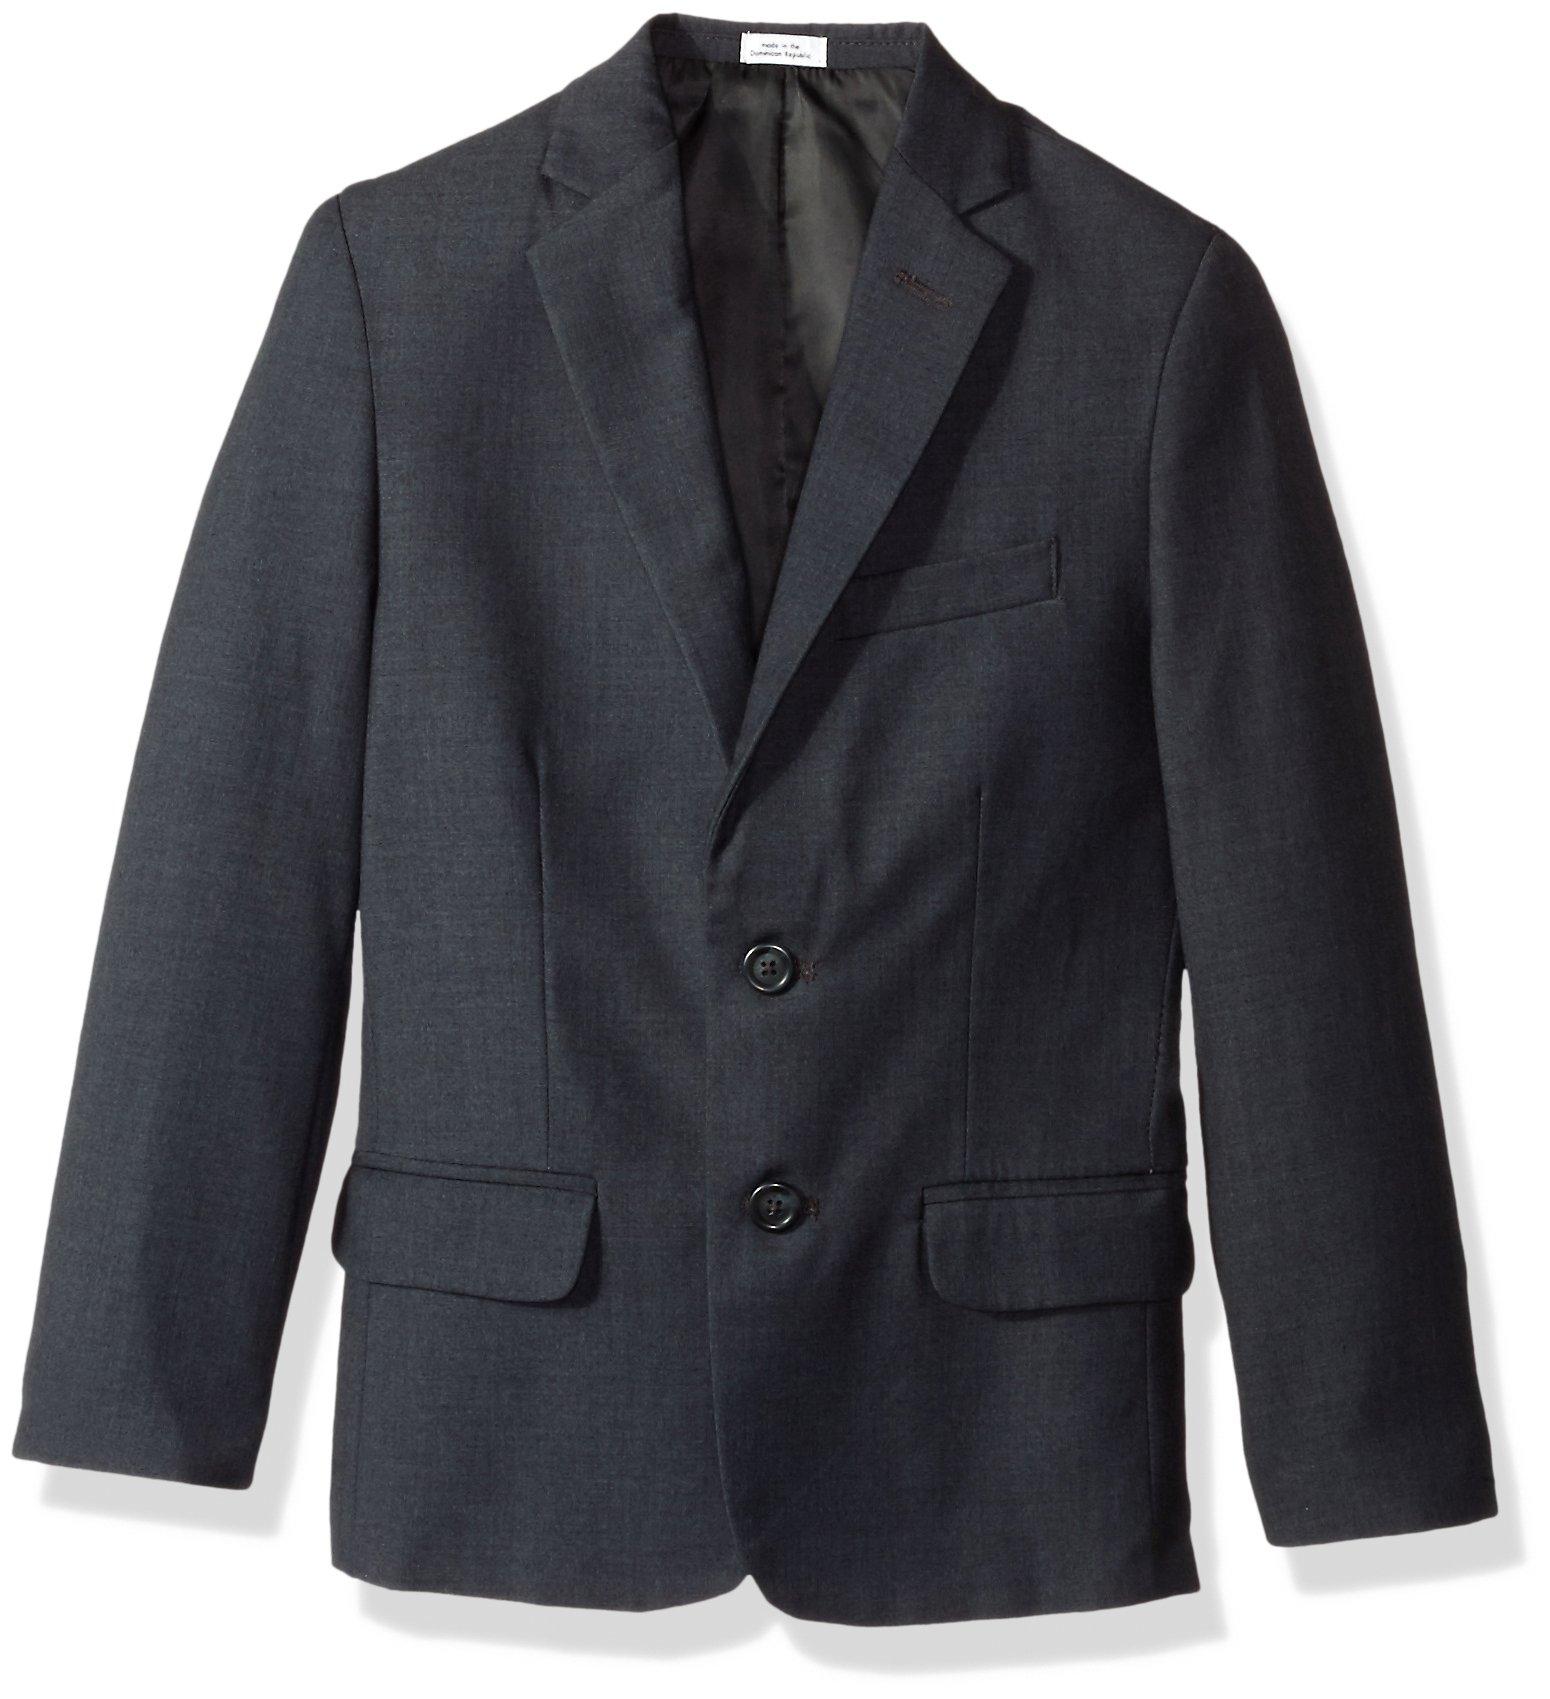 Calvin Klein Dress Up Big Boys' Fine Line Twill Jacket, Dark Charcoal Heather Grey, 20